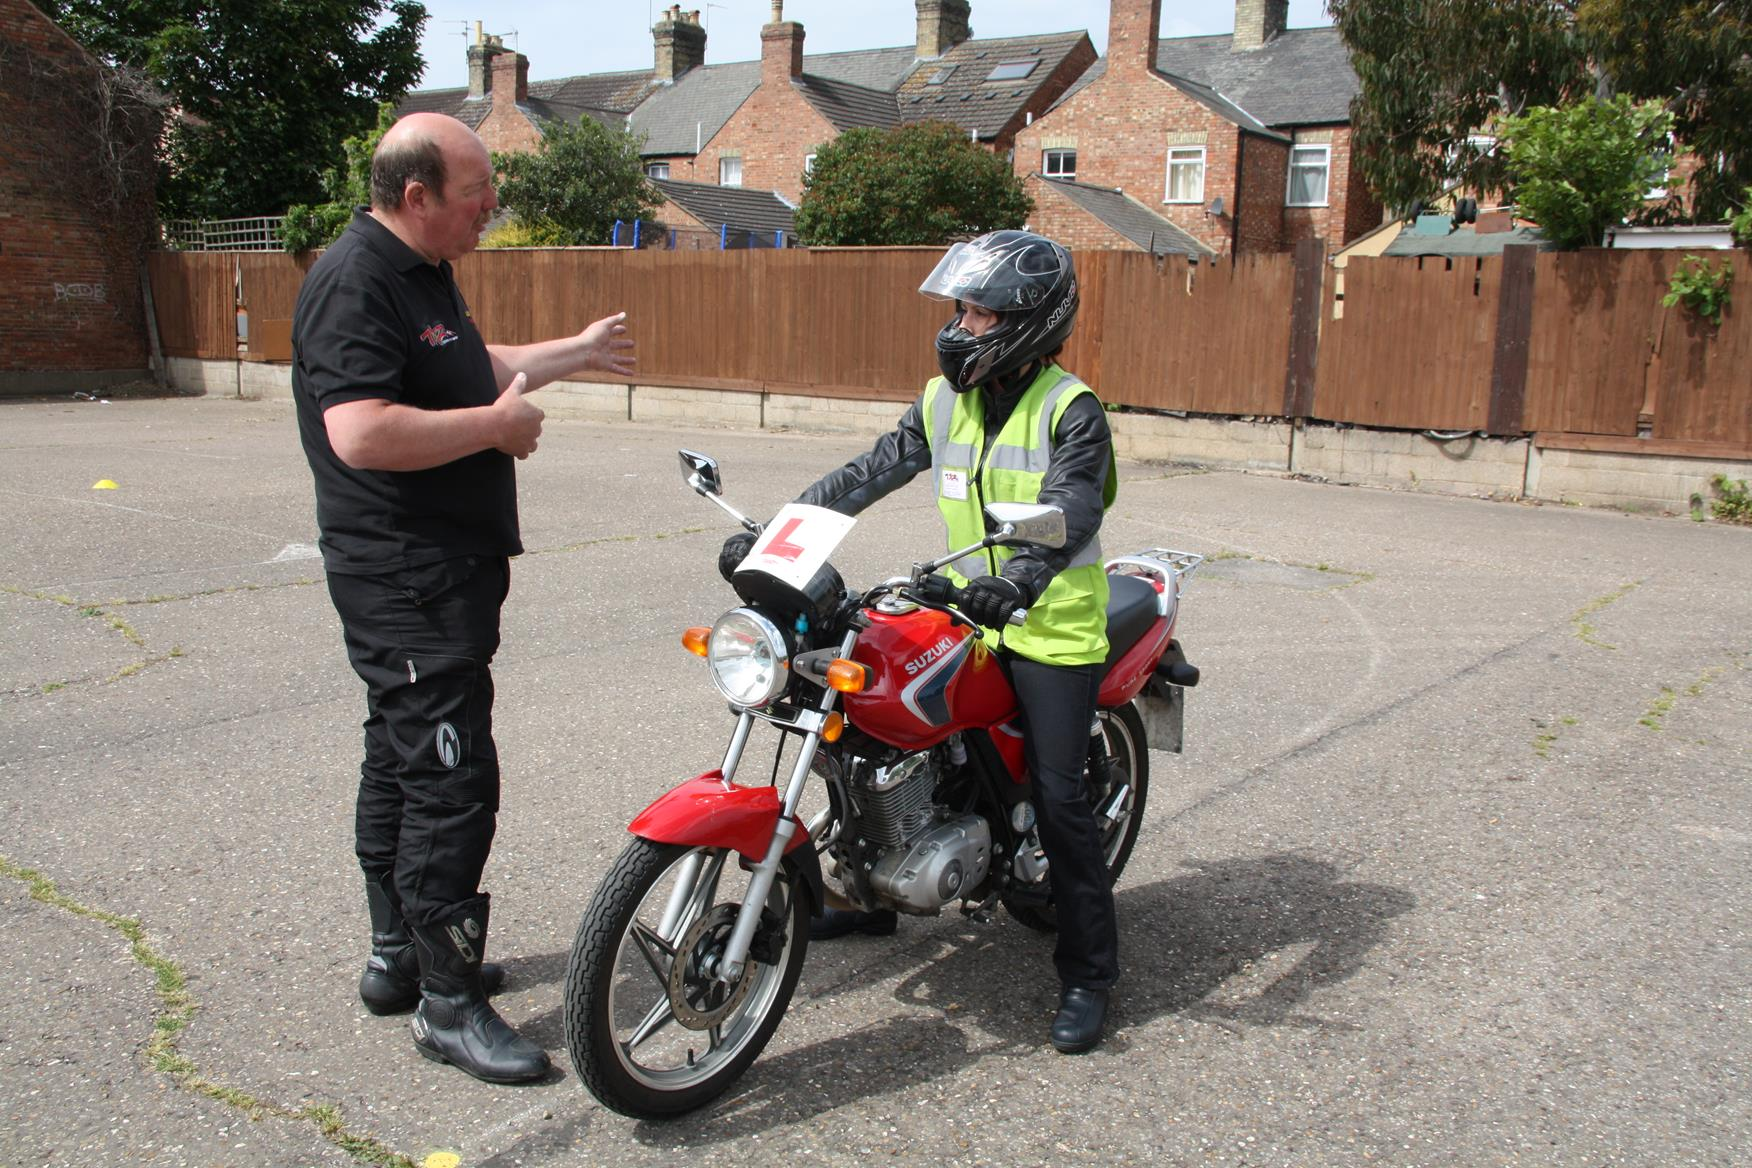 United Motorcycle Training Ltd Newport